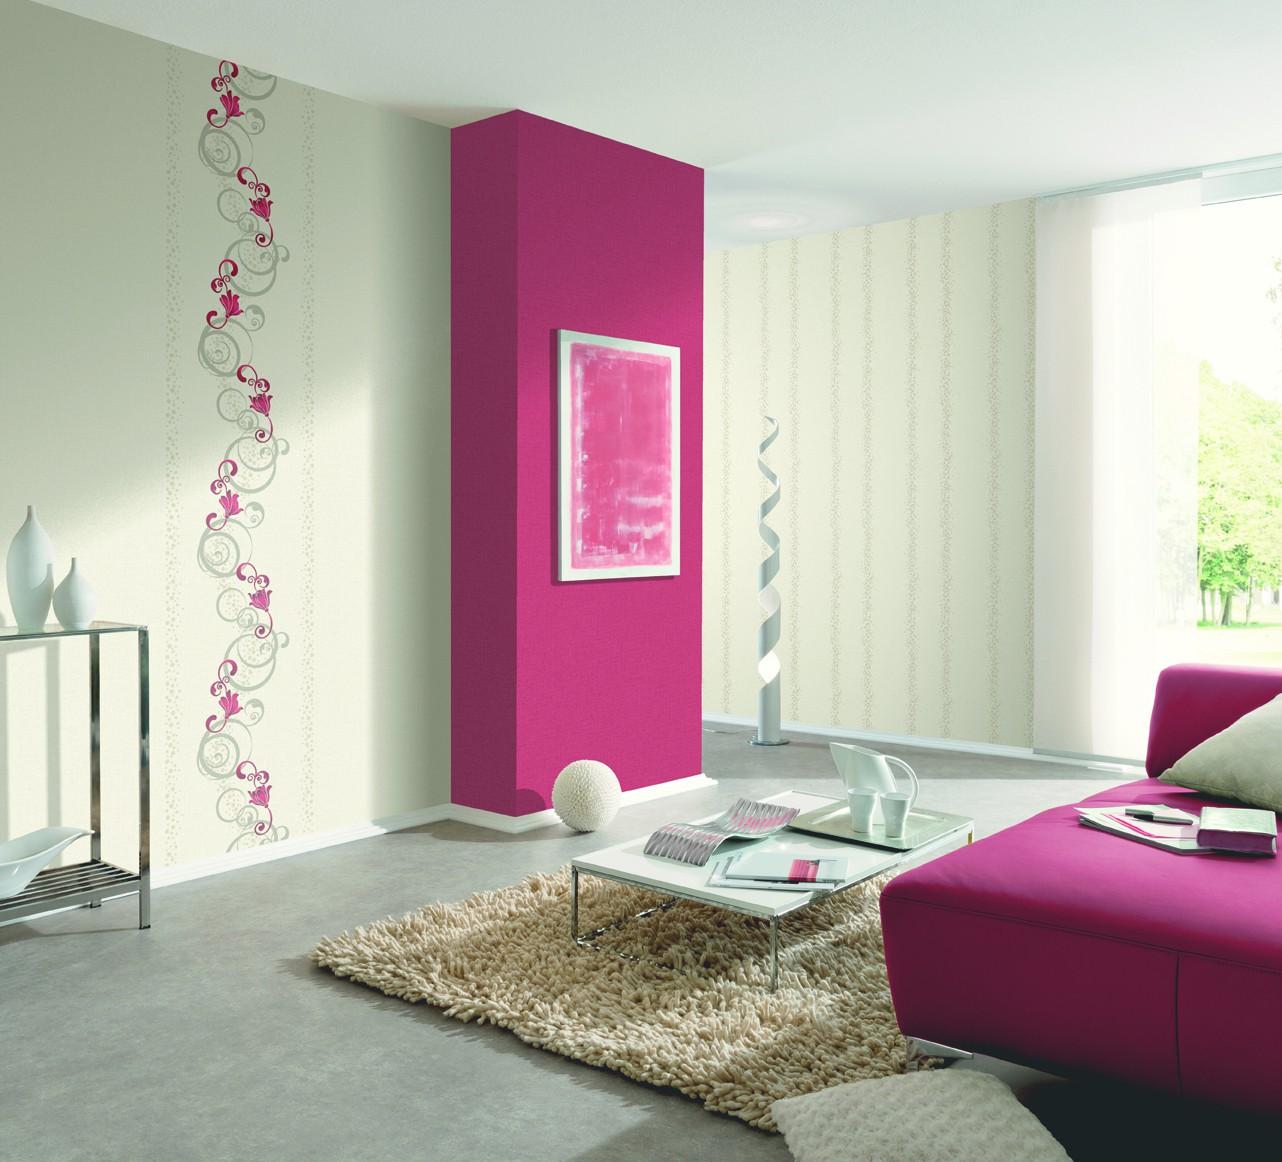 vliestapete blumen grafisch rot grau tapete p s pure easy 13287 20. Black Bedroom Furniture Sets. Home Design Ideas